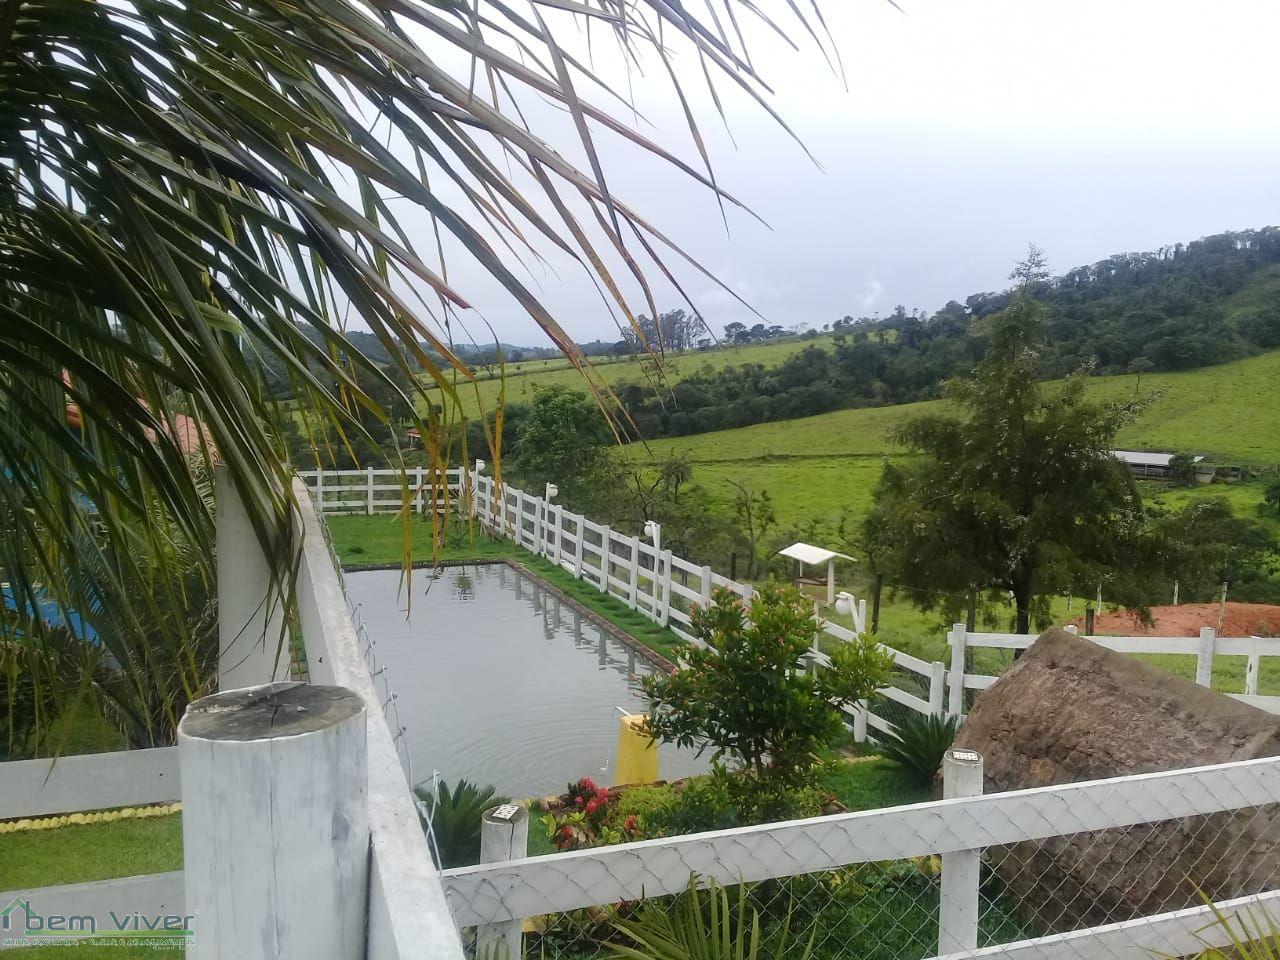 Fazenda - Fazenda 55ha Crucilândia MG | cod.: 212513 R$ 2.000.000,00